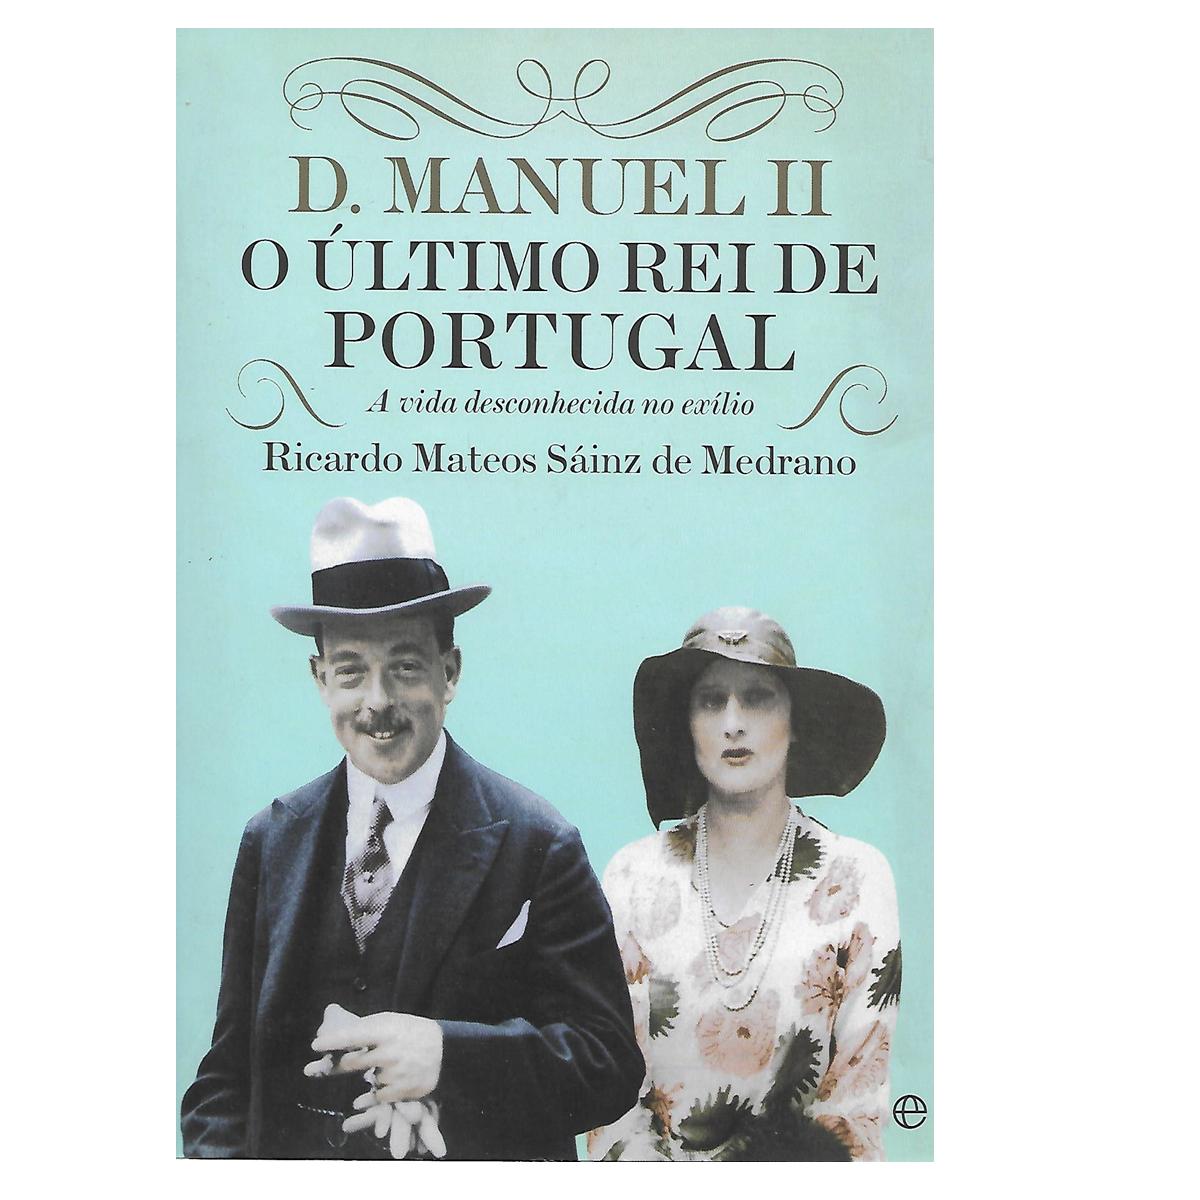 D. MANUEL II, O ÚLTIMO REI DE PORTUGAL